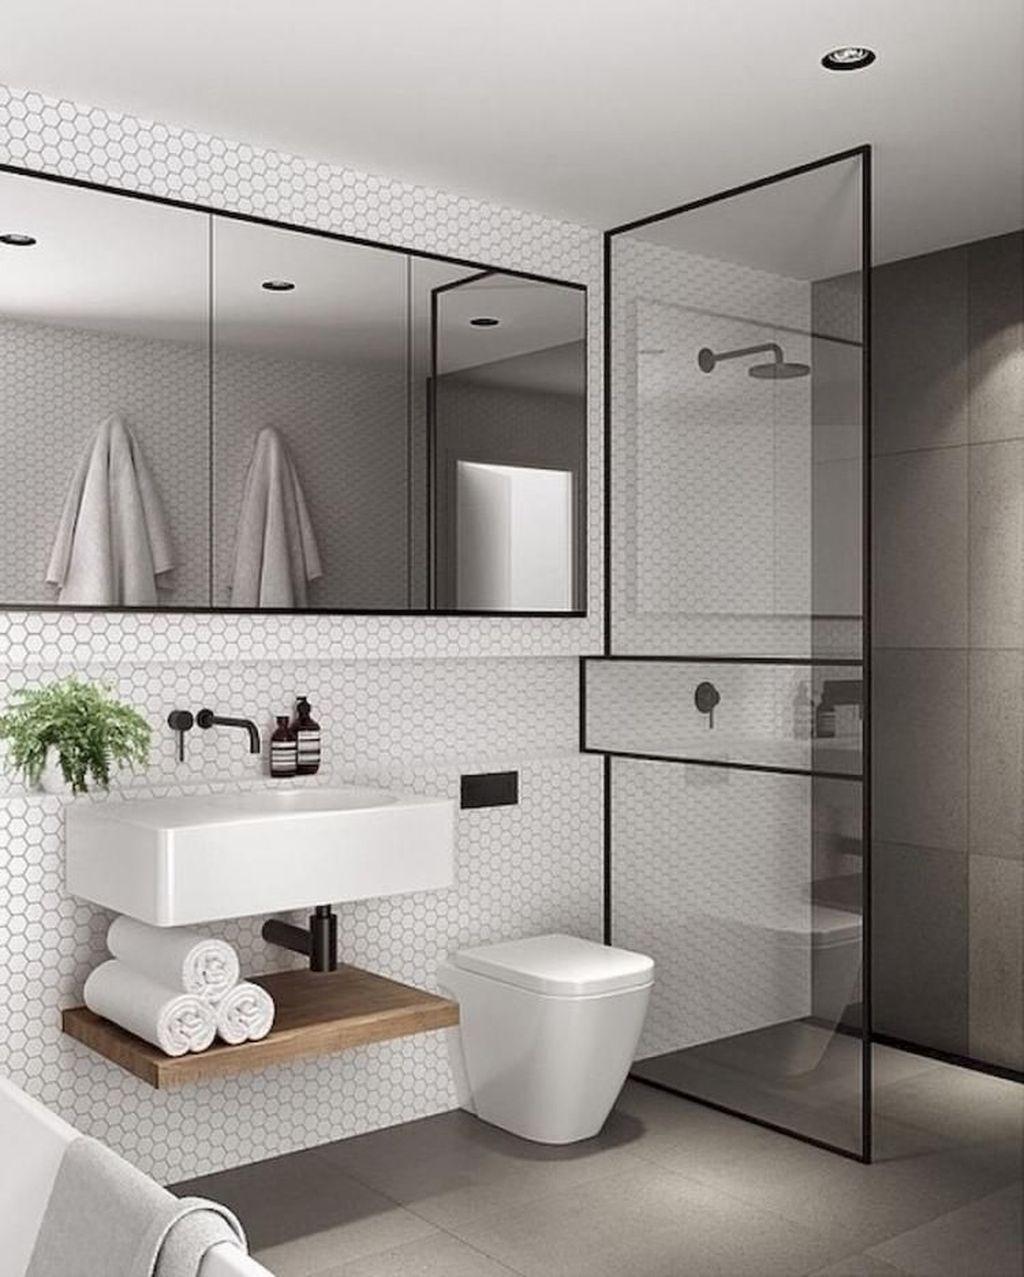 41 Stylish Small Master Bathroom Remodel Design Ideas ... on Master Bathroom Remodel Ideas  id=78715